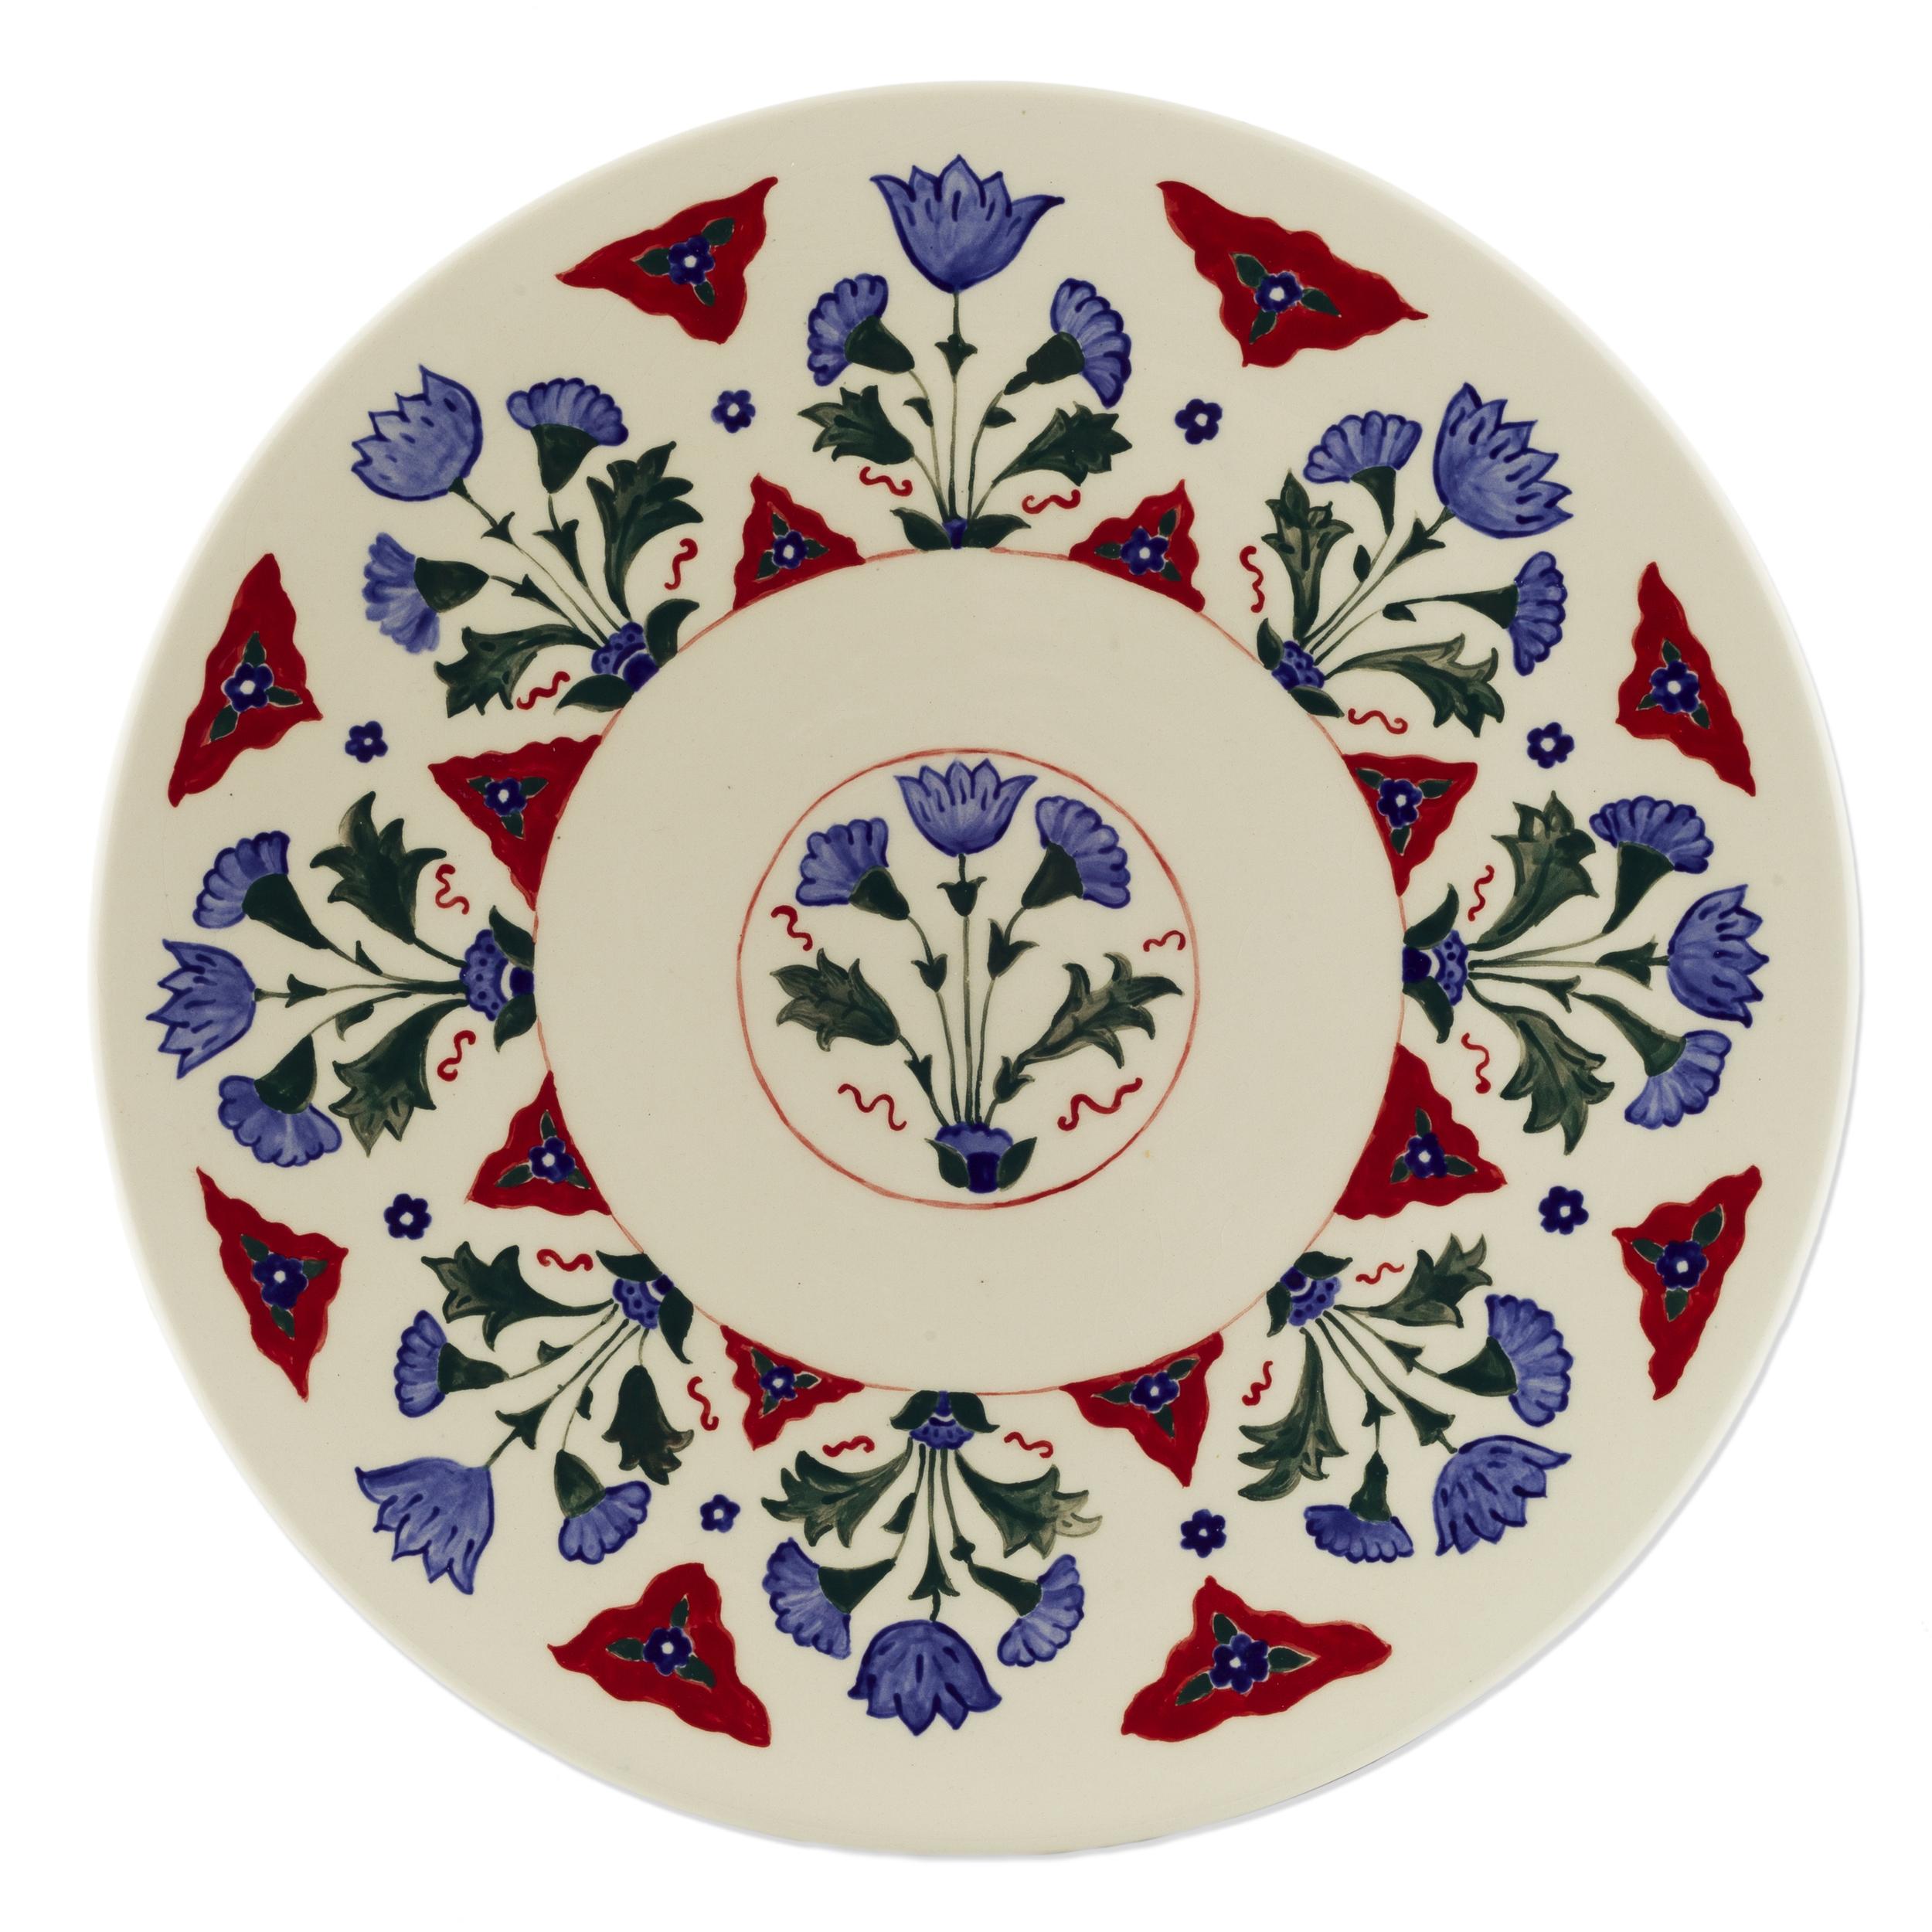 Iznik Plate 2 ~ Islimi, Turkish Ottoman Art, Islamic Art, Pattern Design, Shaheen Kasmani.